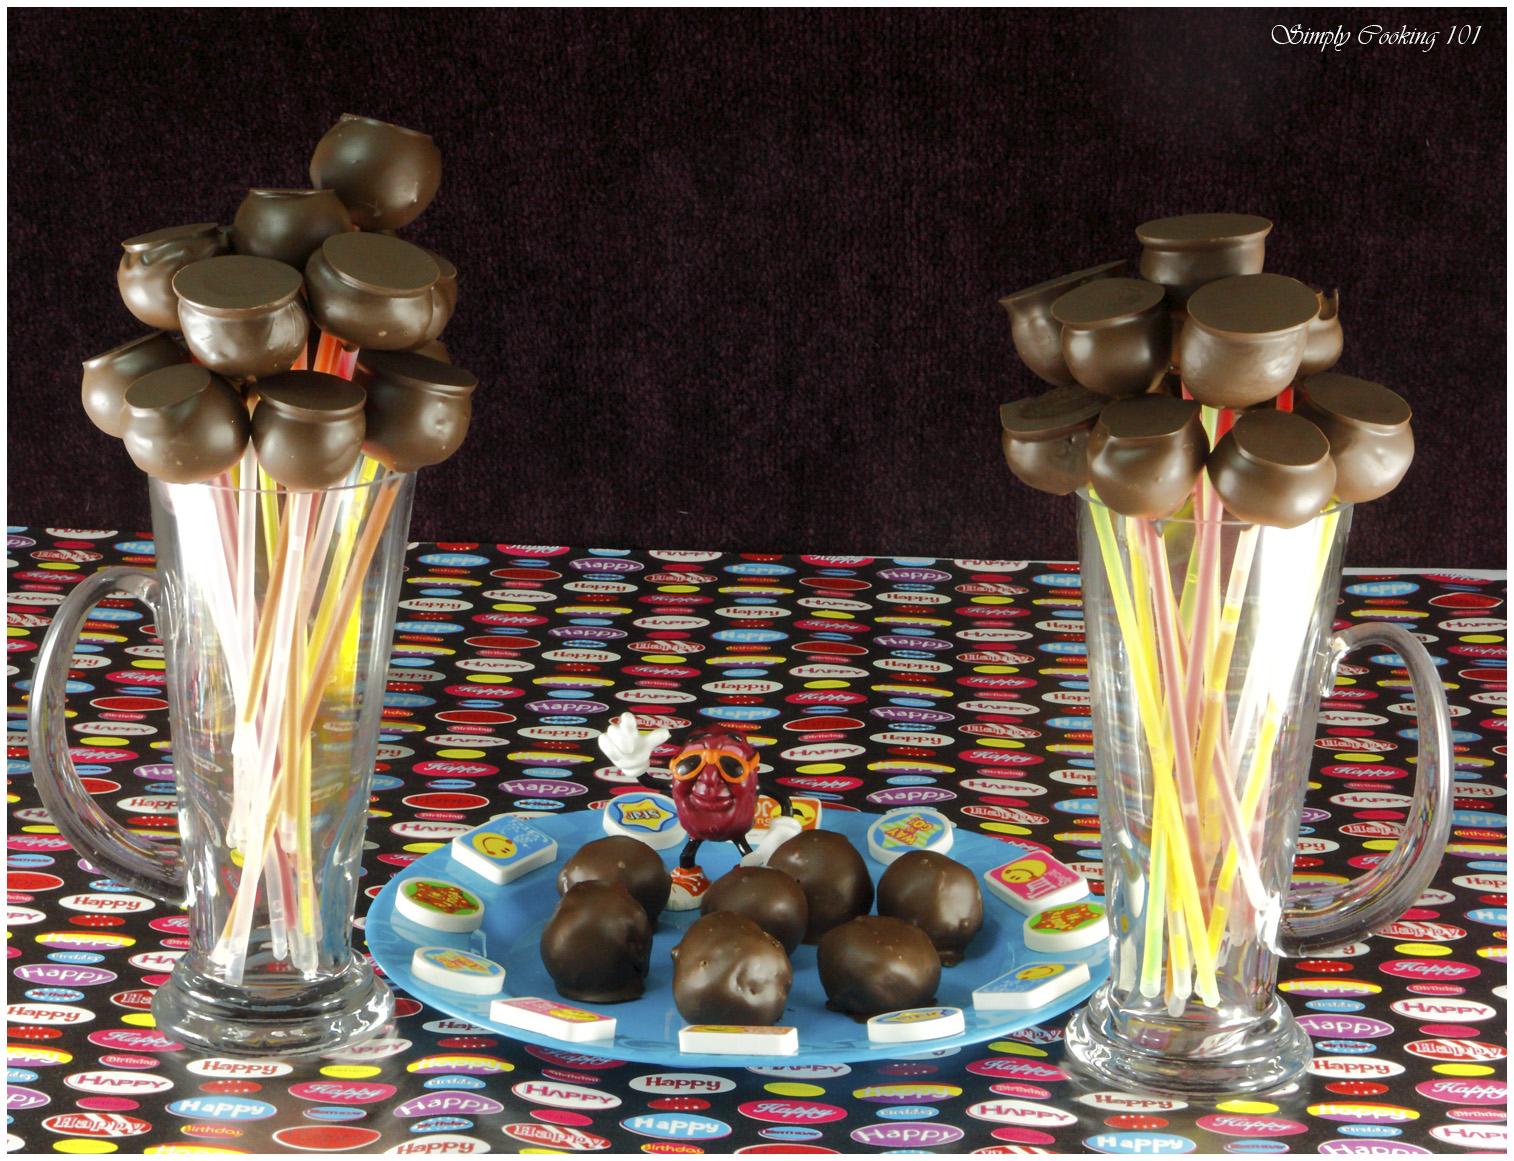 Birthday Brownie Cake Pops on Glo Sticks